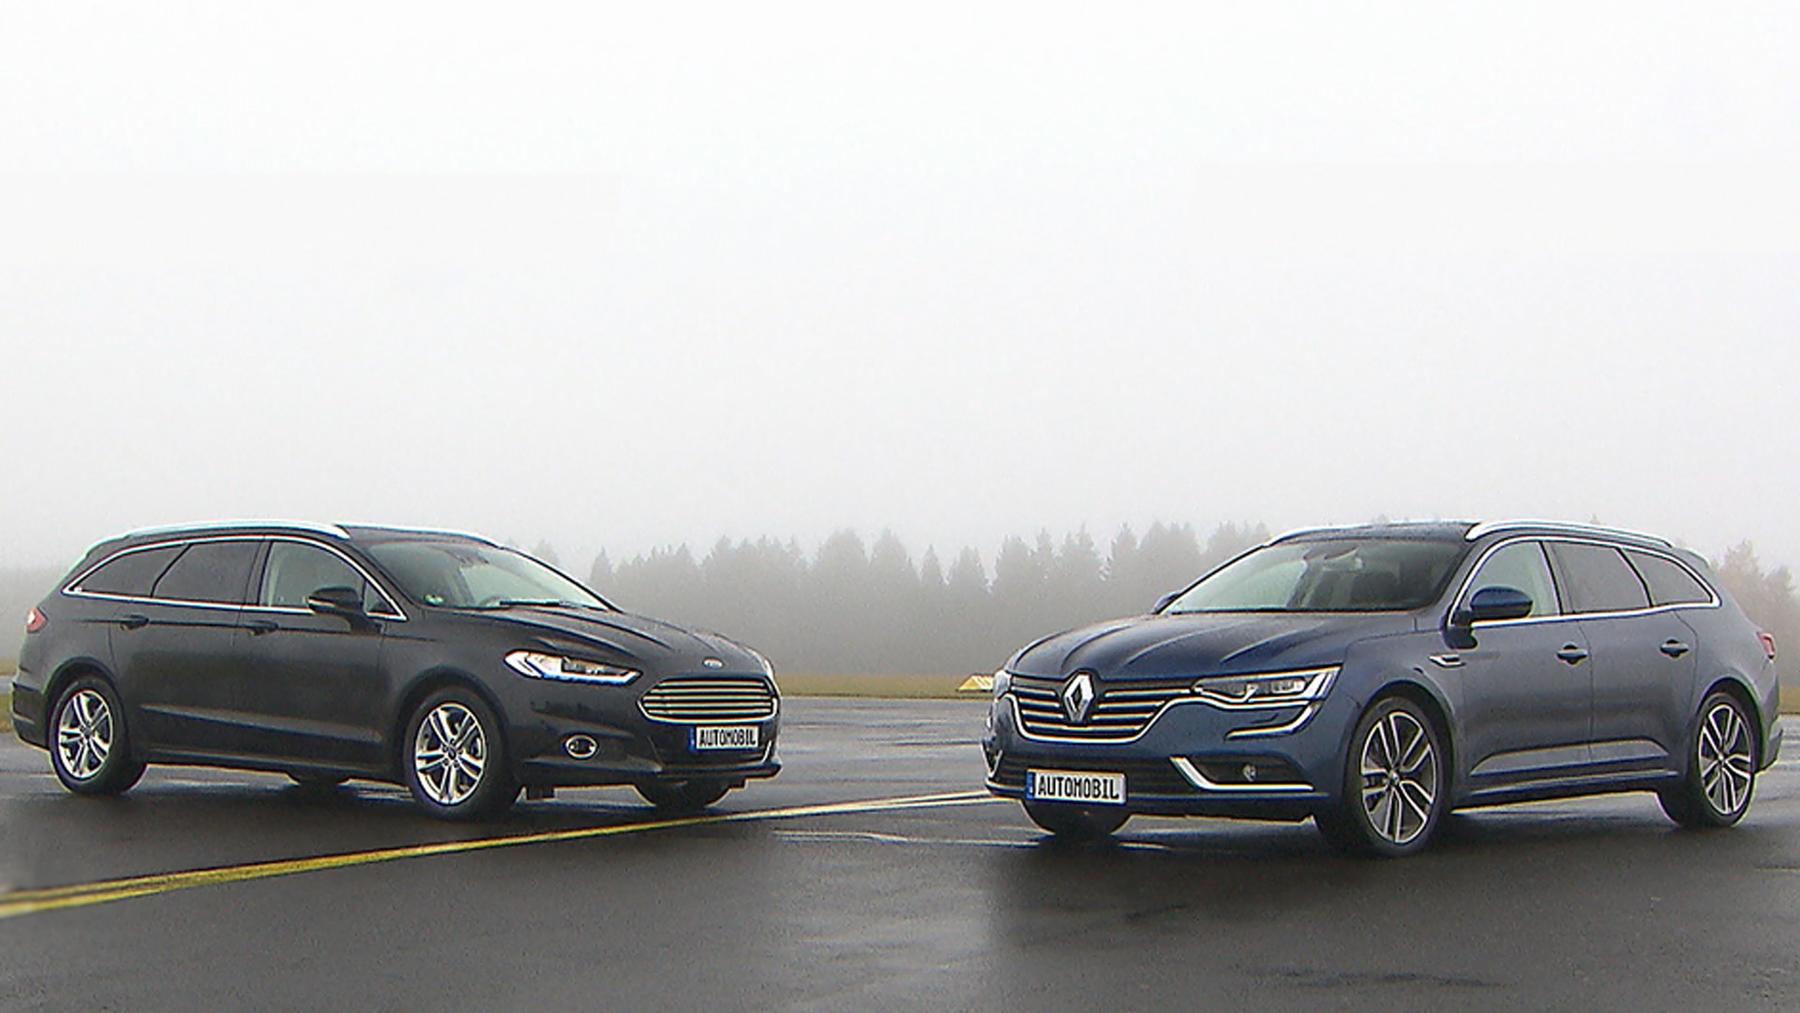 Thema u.a.: Vergleichstest: Renault Talisman / Ford Mondeo